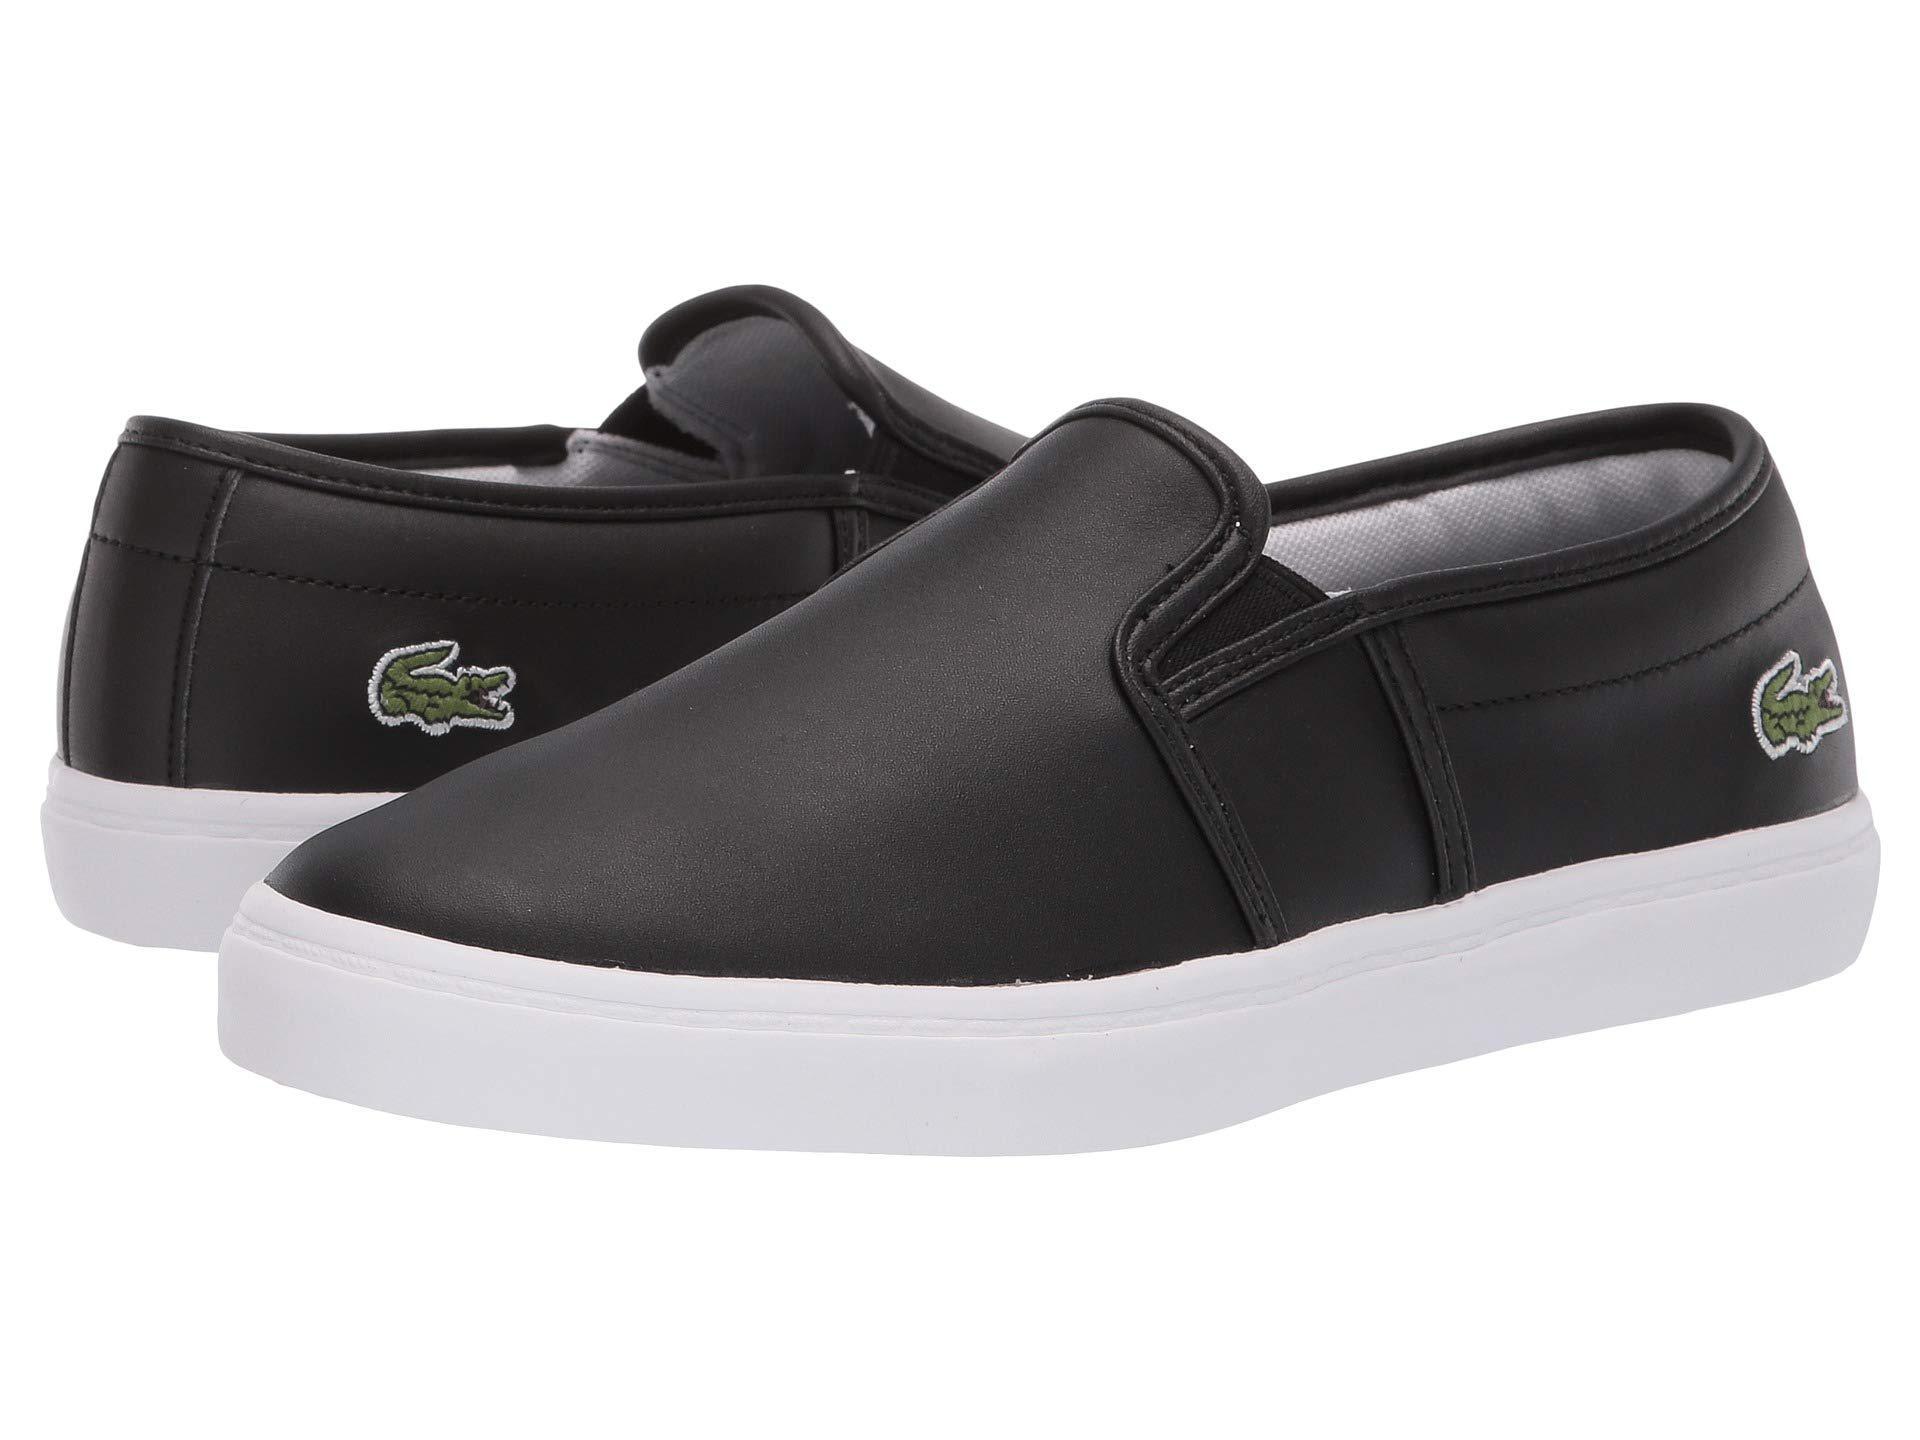 d9f520b6 Lacoste Tatalya 119 2 P Cfa (black/white) Shoes in Black - Lyst